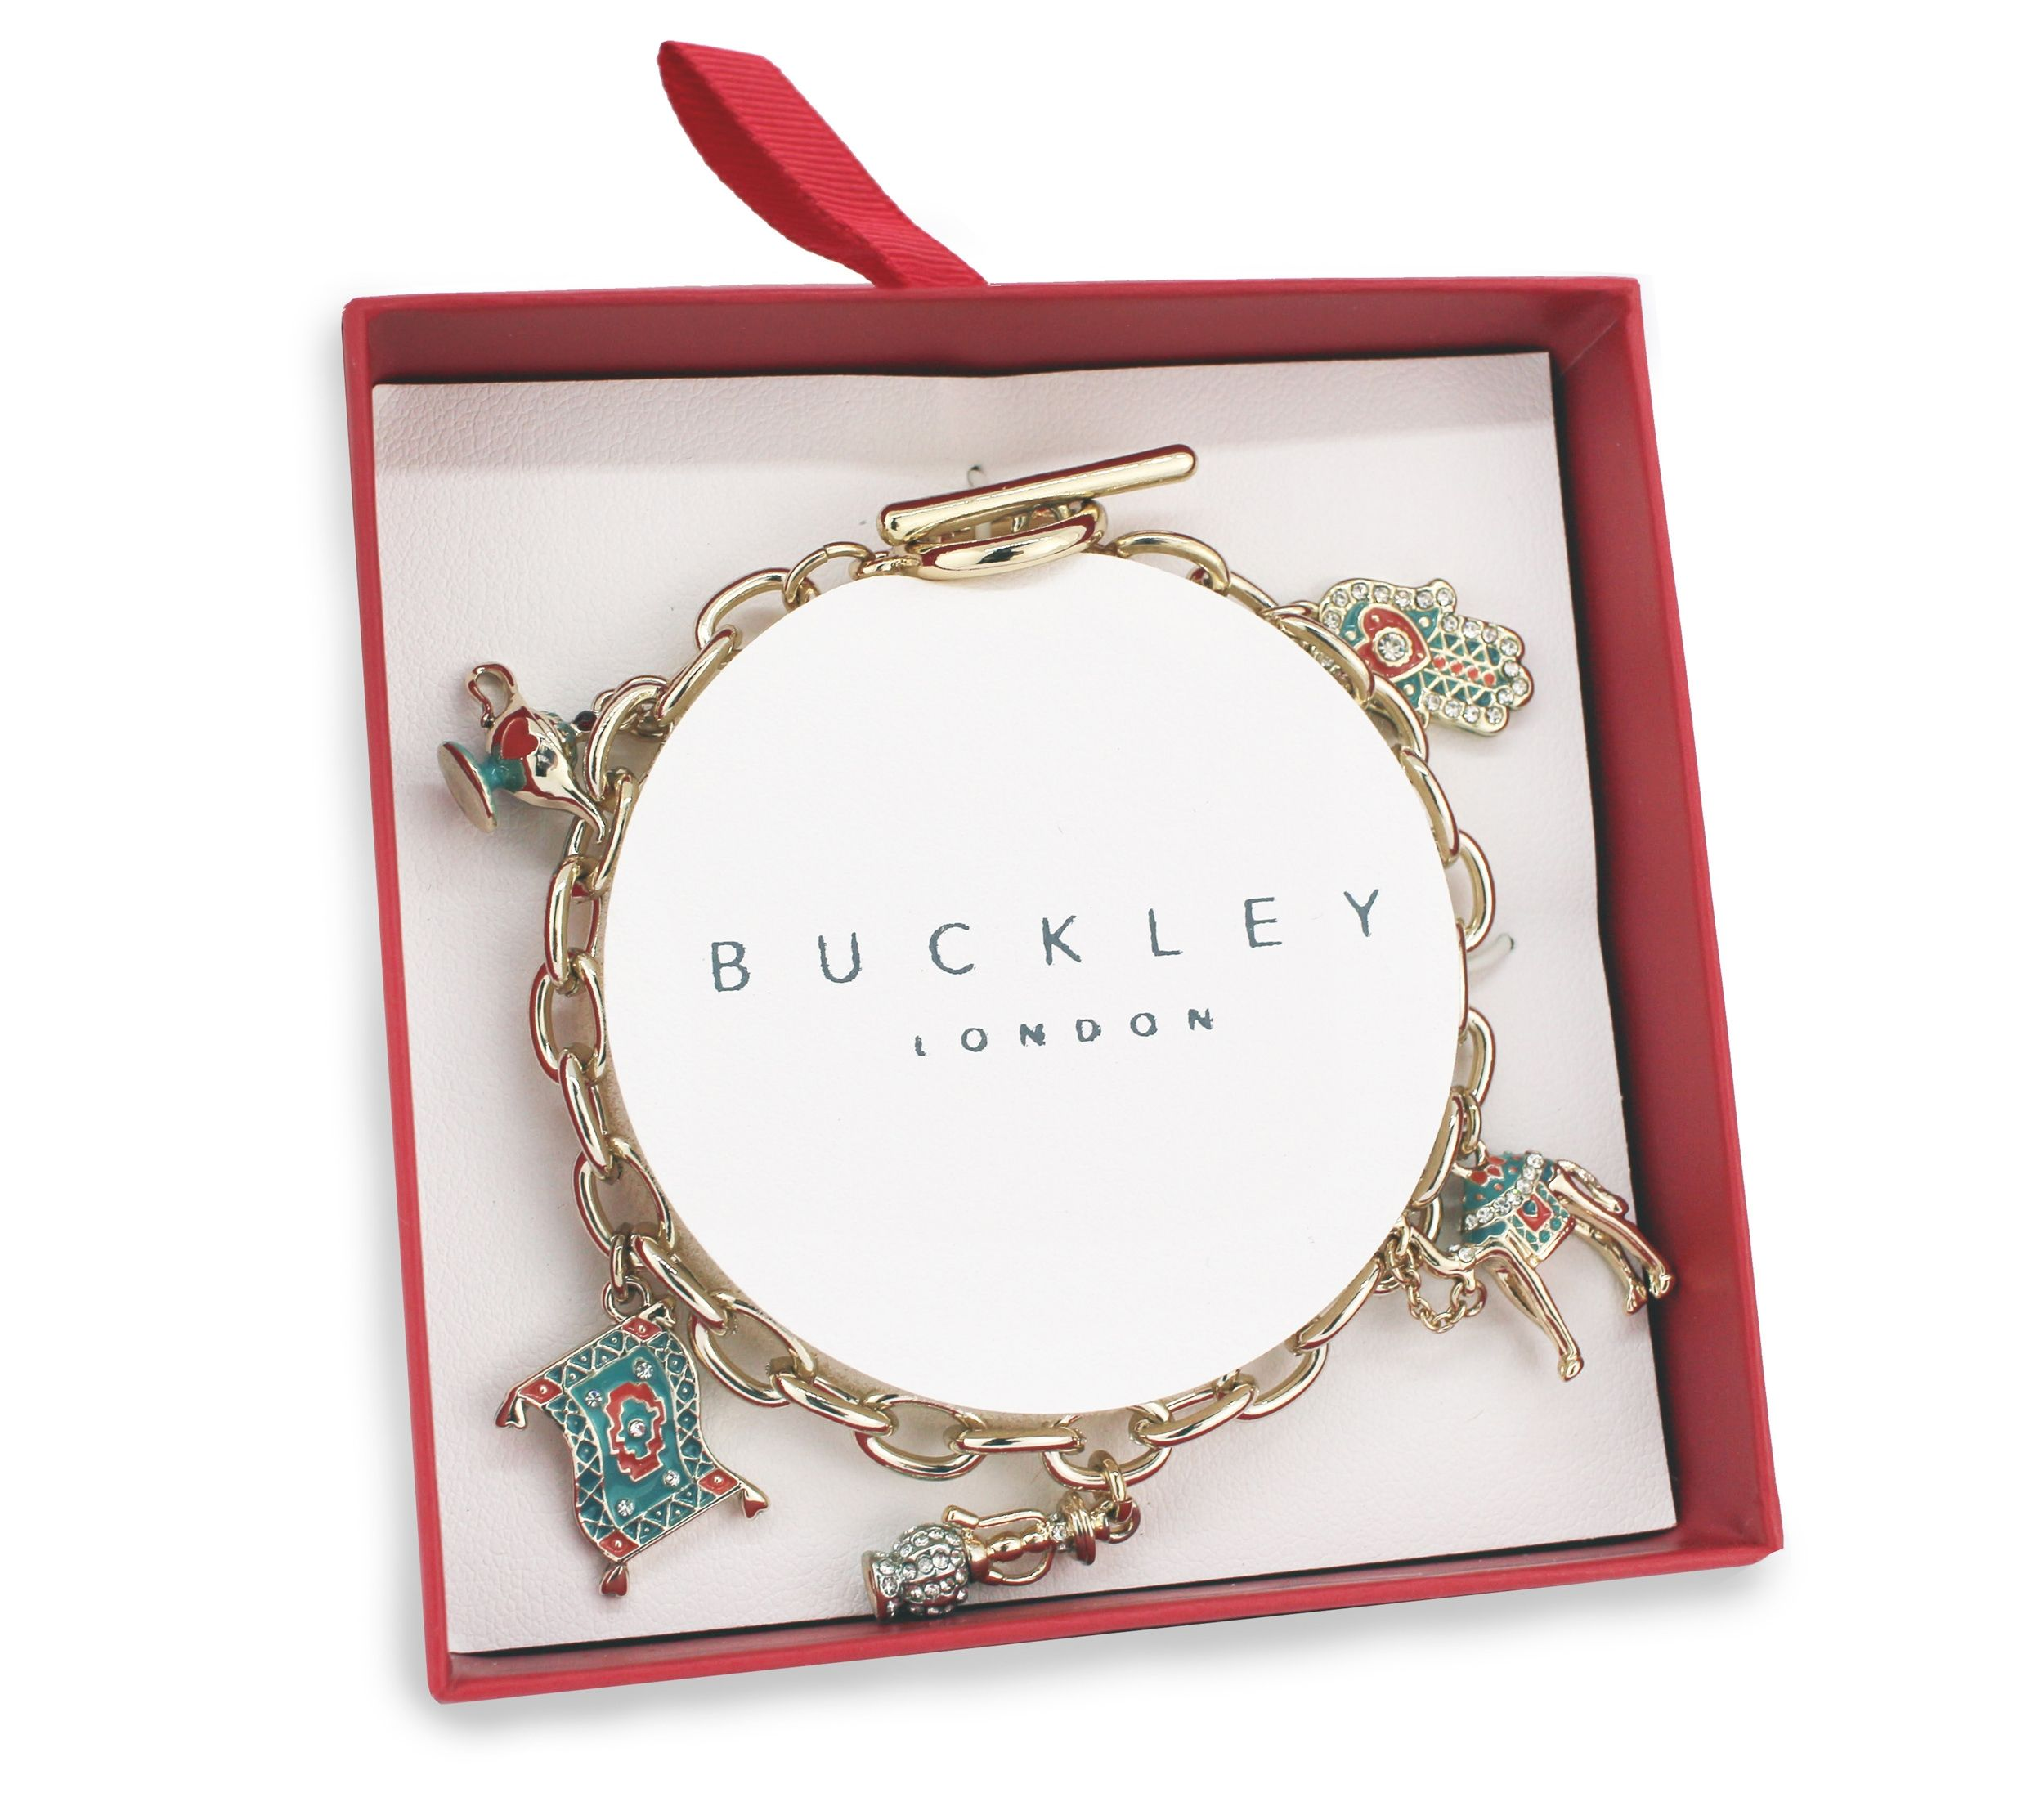 Buckley London Eastern Wishes Charm Bracelet Box